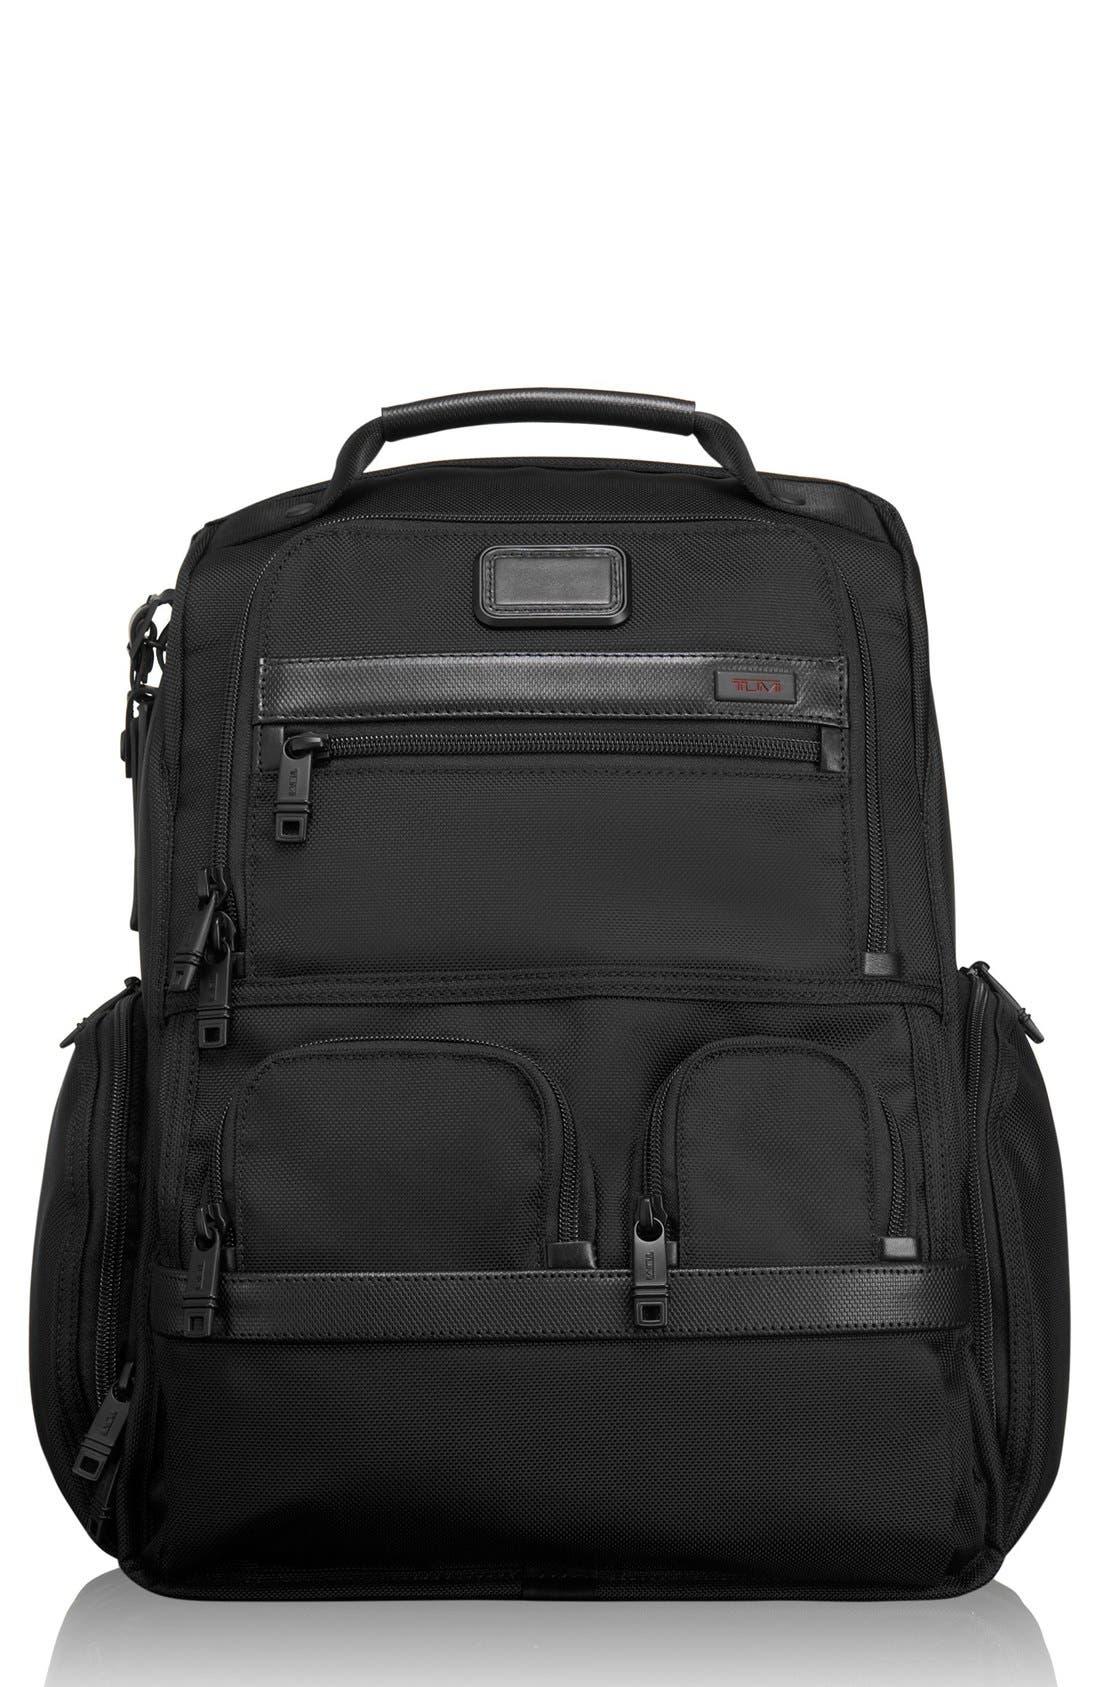 Alpha 2 Compact Laptop Brief Pack<sup>®</sup>,                             Main thumbnail 1, color,                             Black